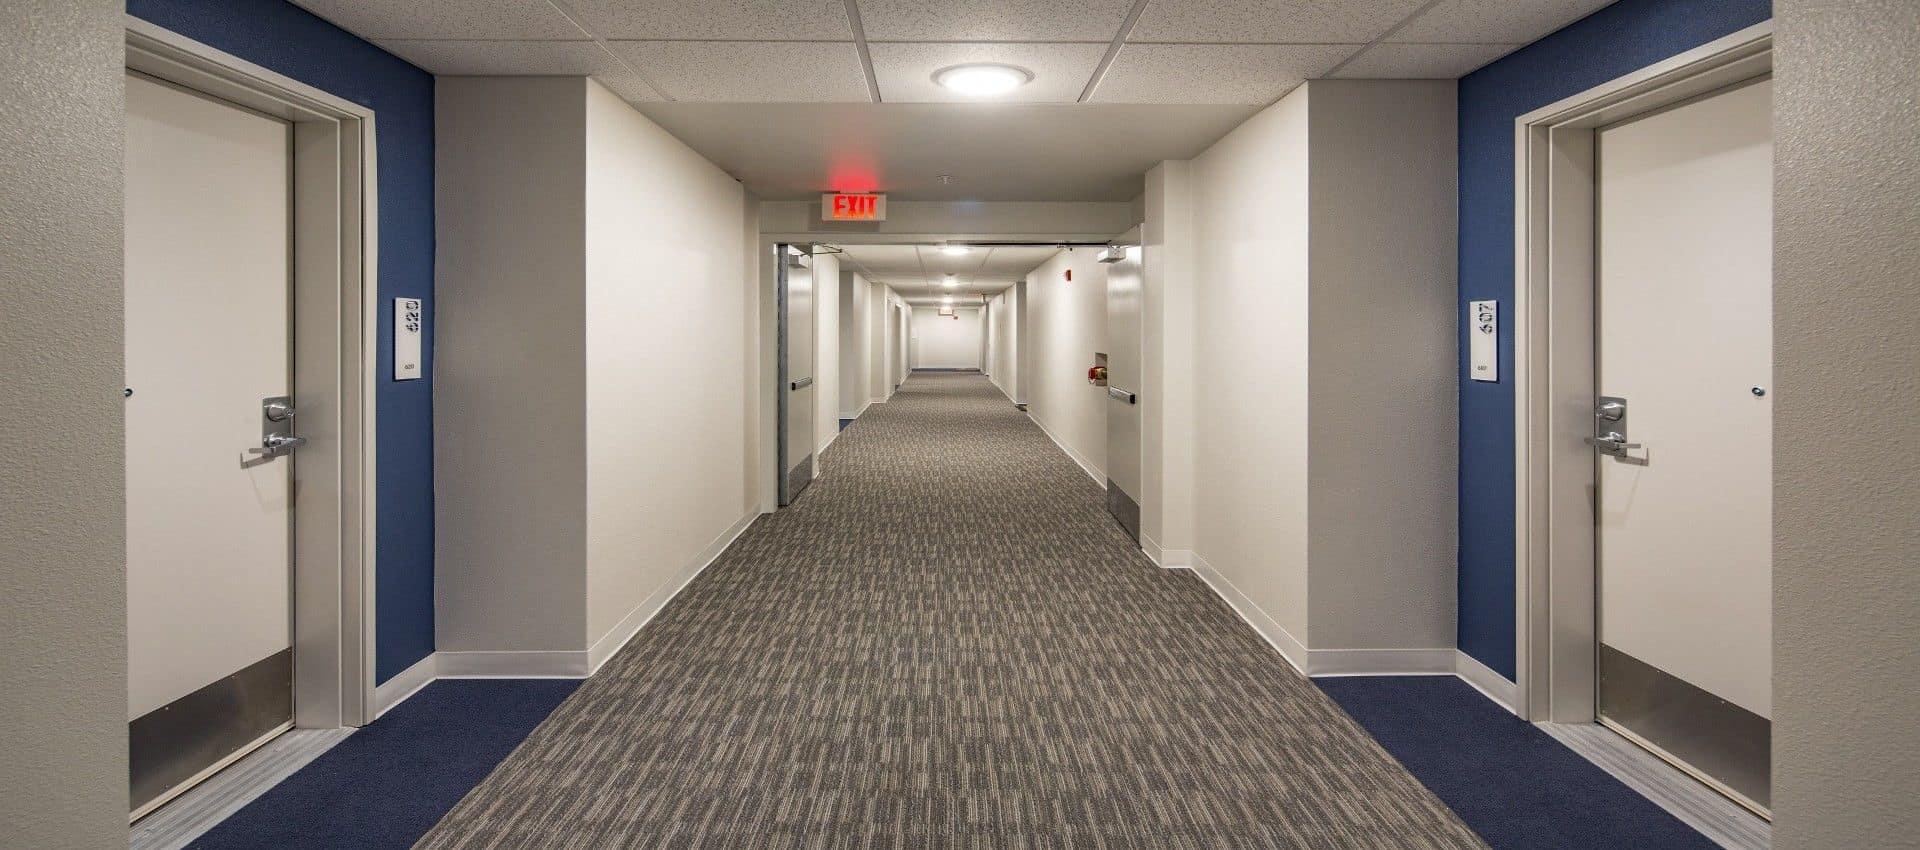 Hallway entrances at EVIVA Midtown in Sacramento, California